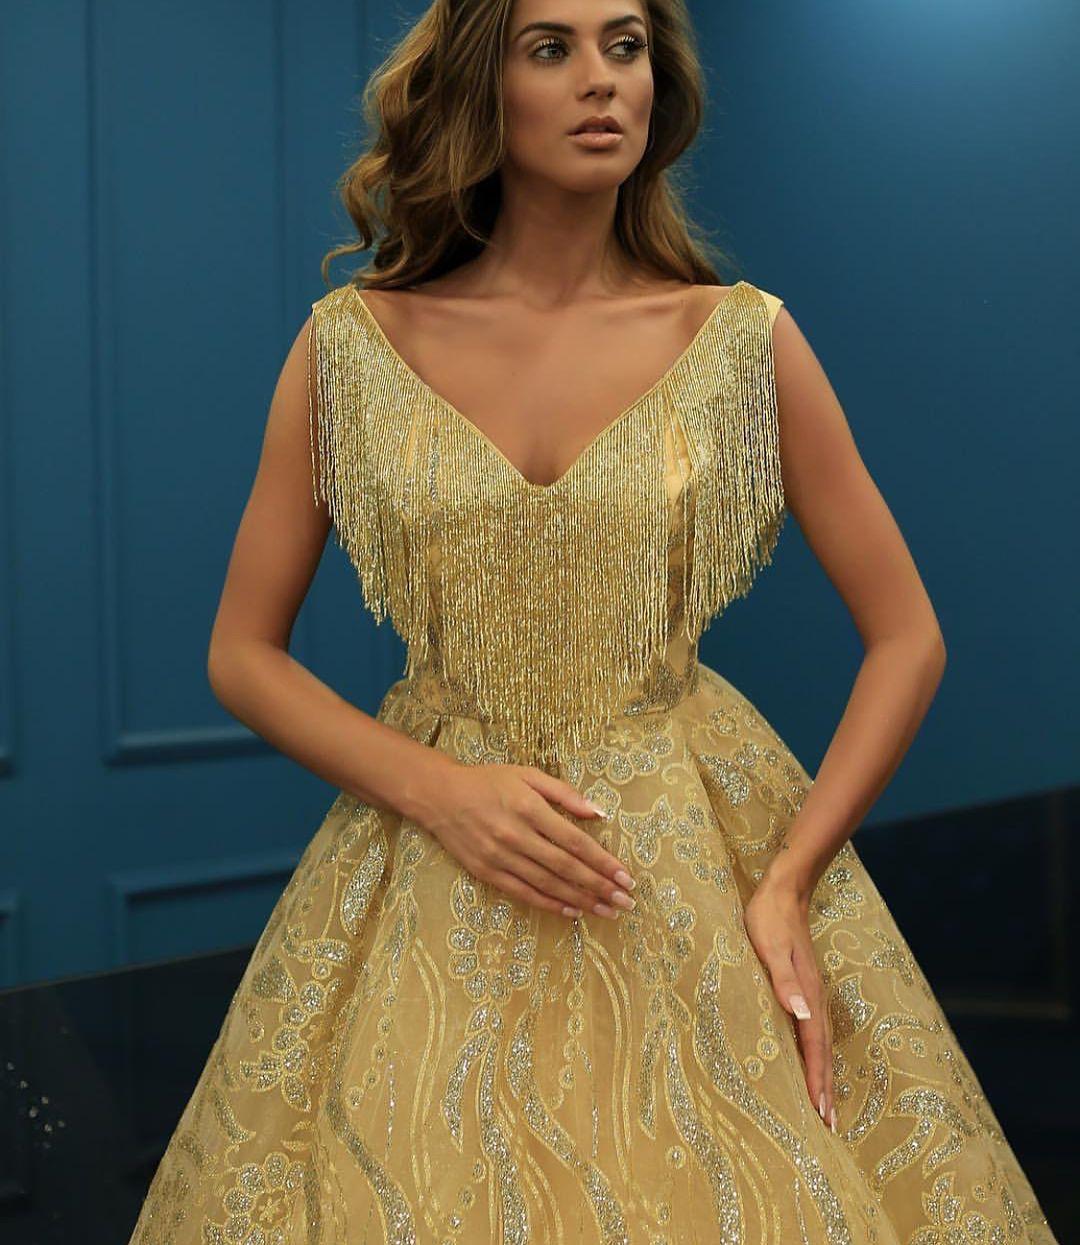 Pin By Malak Alahdal On عرس Dresses Sleeveless Formal Dress Fashion